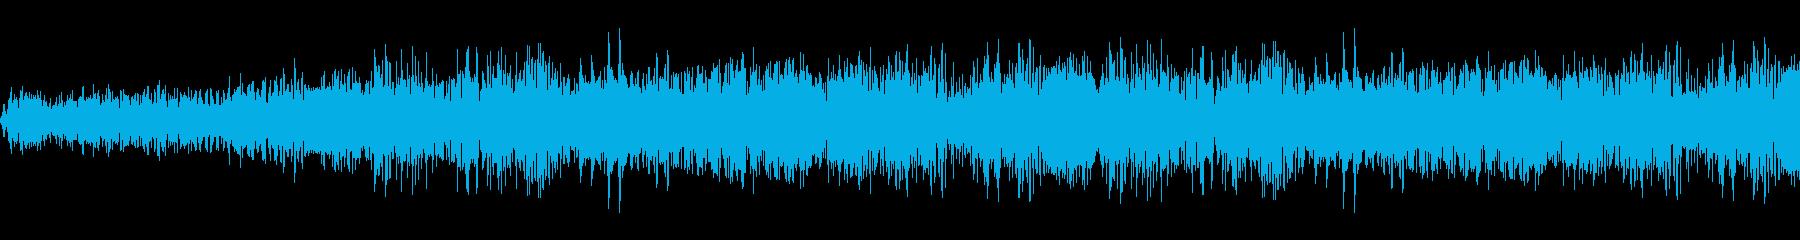 SciFi EC01_93_1の再生済みの波形